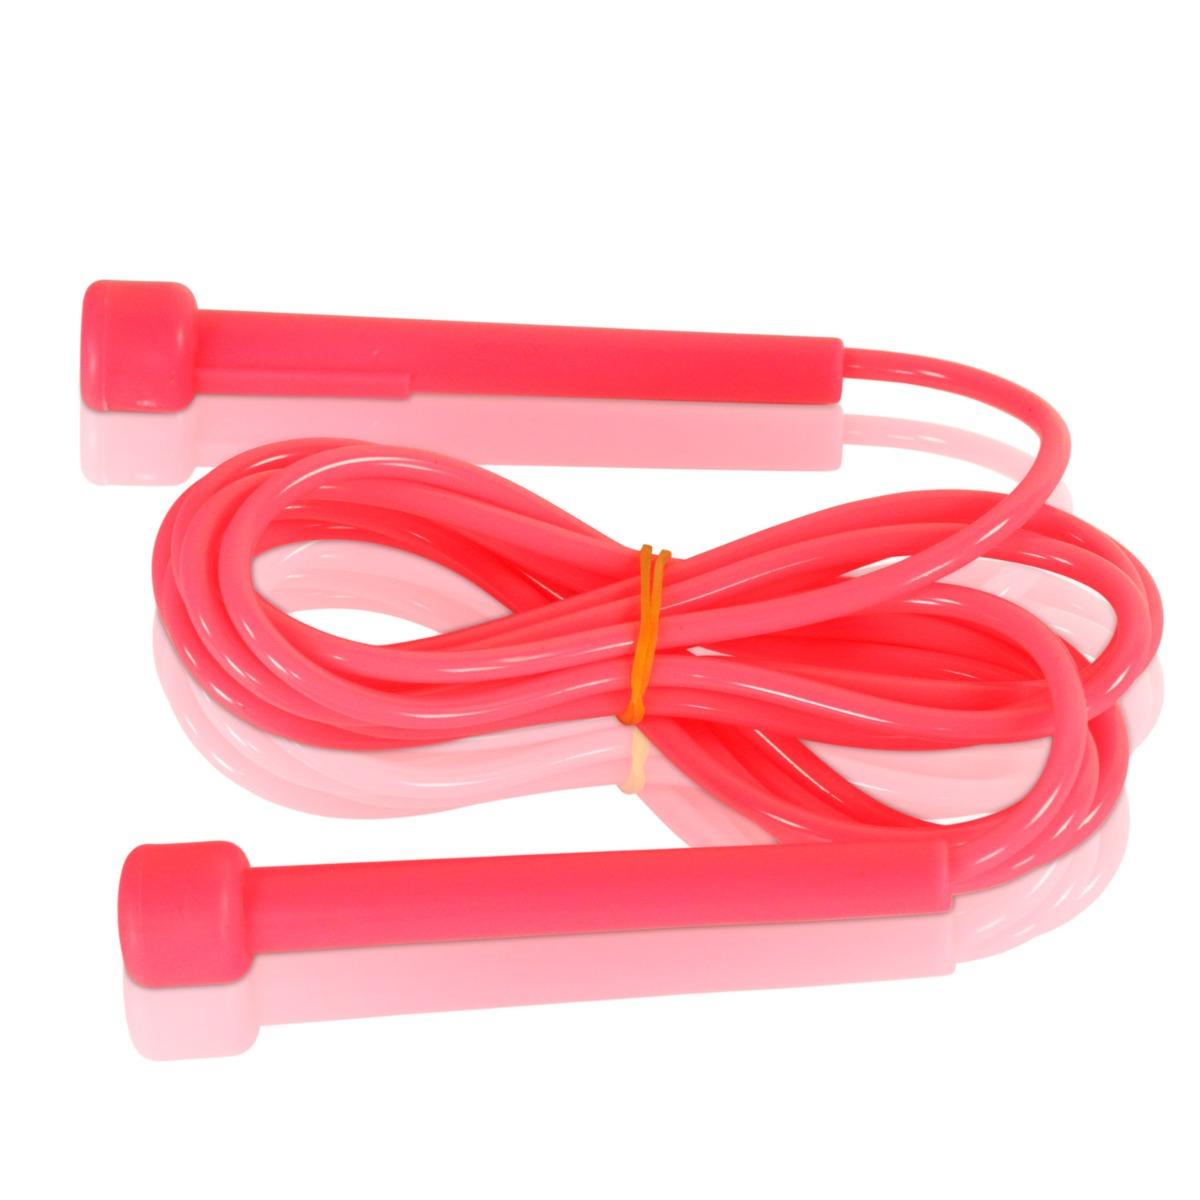 Odin Speed Rope Sjippetov Pink